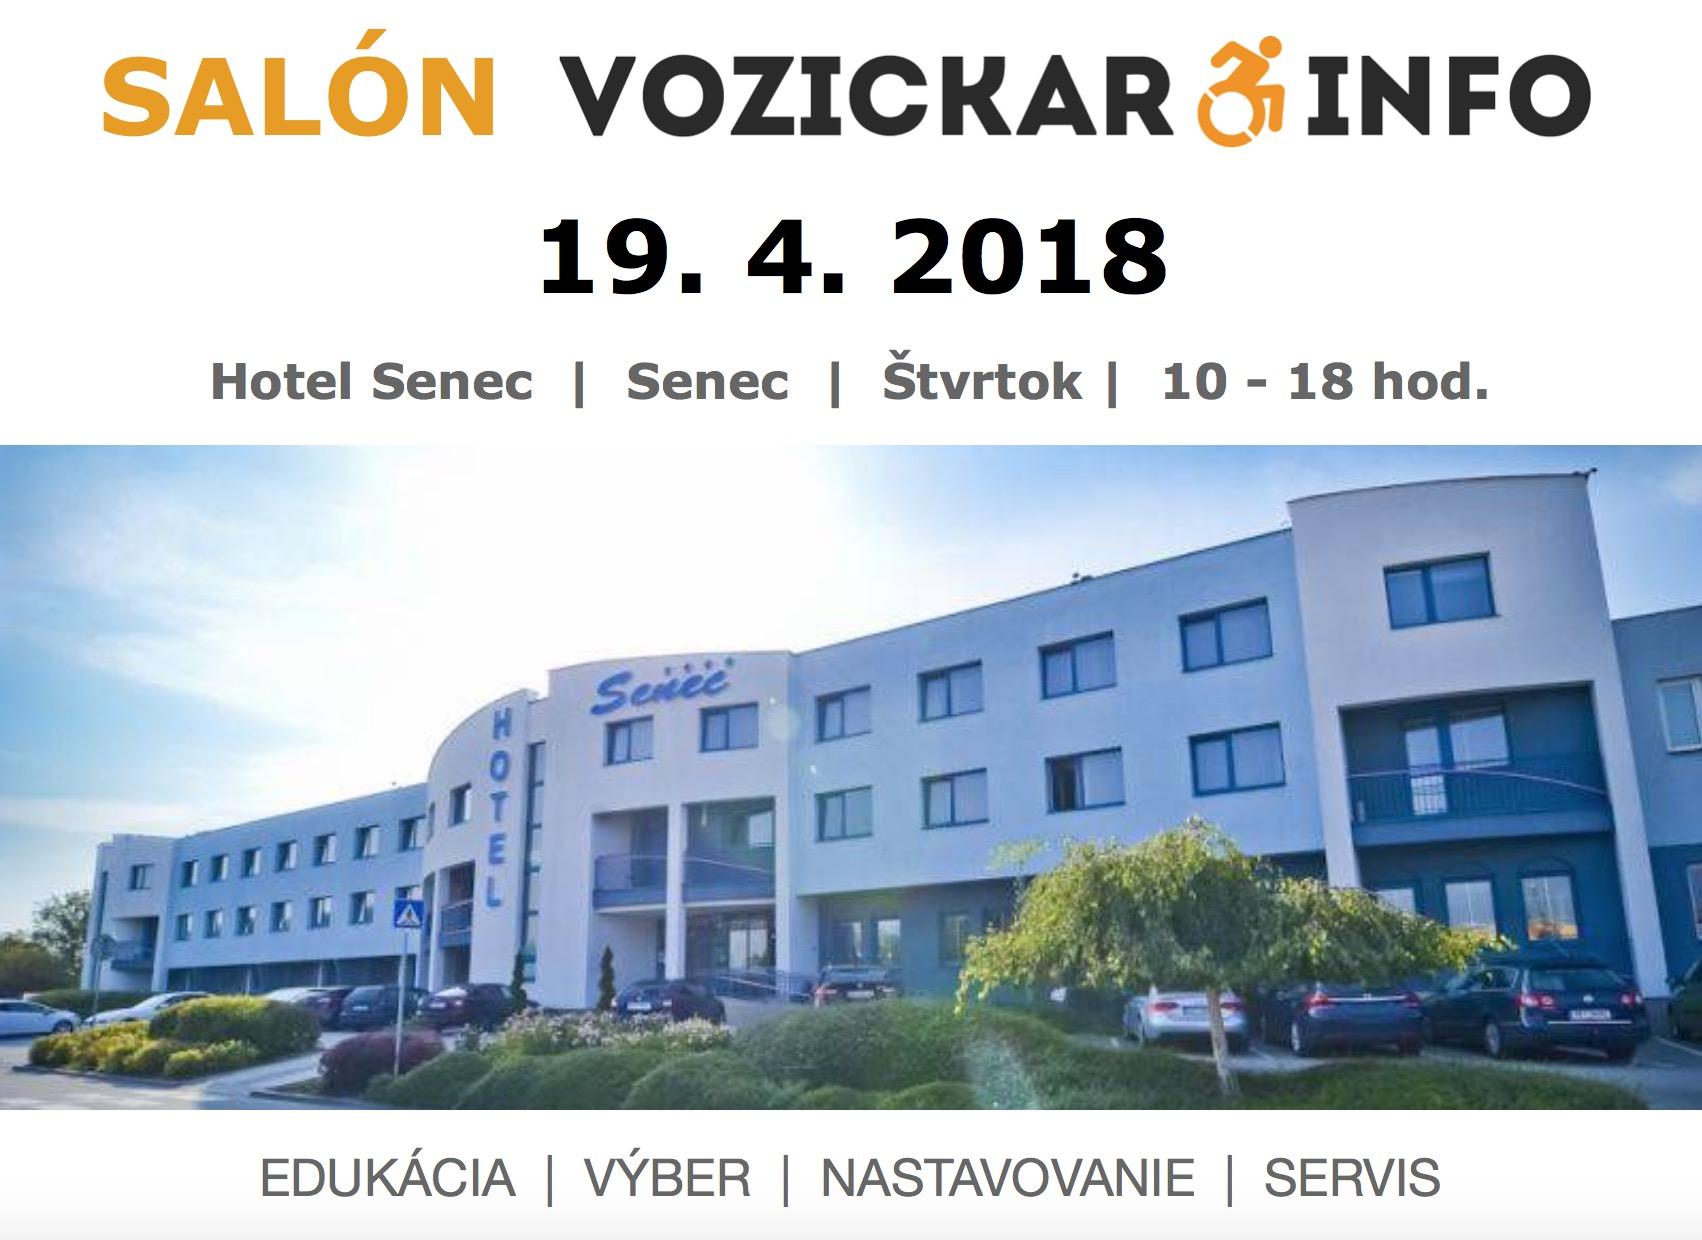 Salón - Vozickar.info